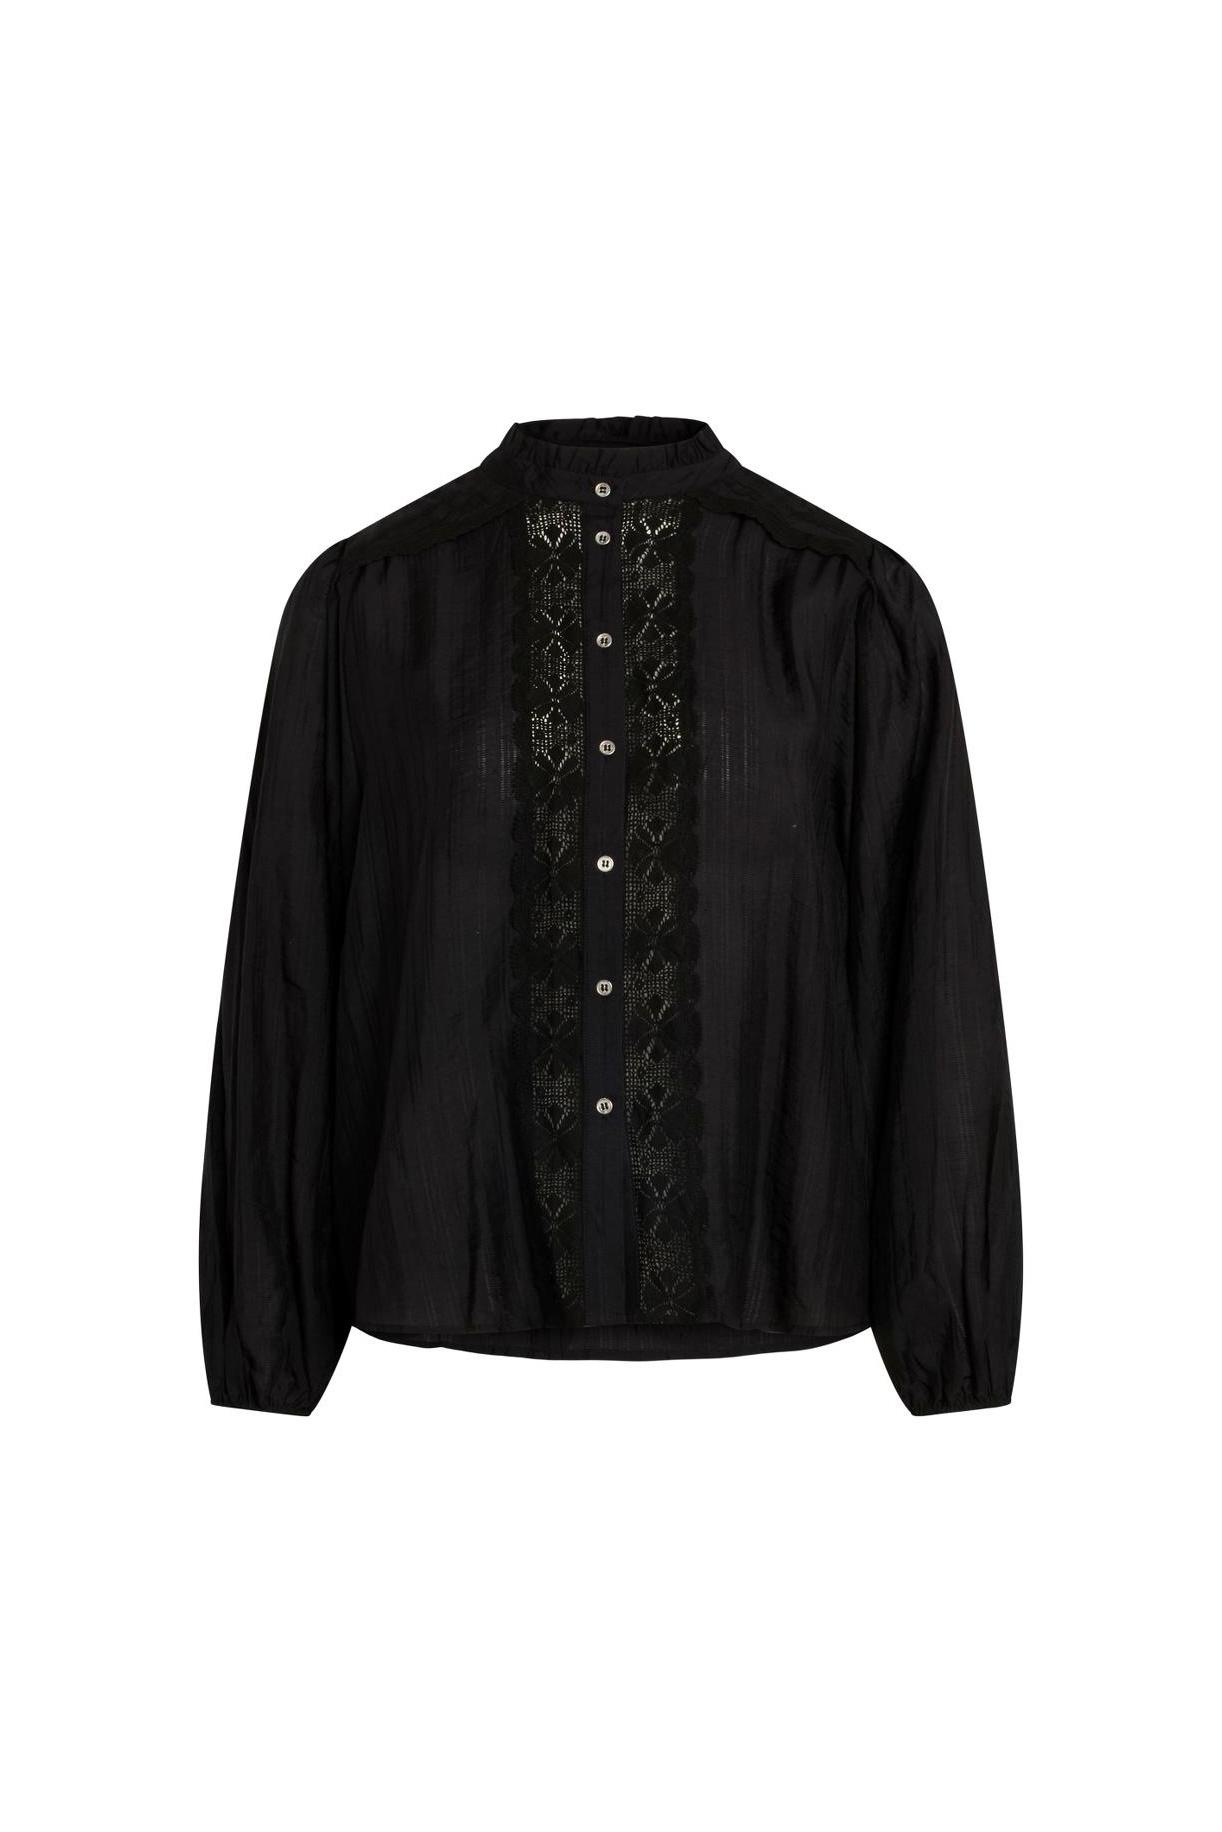 Lisissa Lace Shirt - Black-1